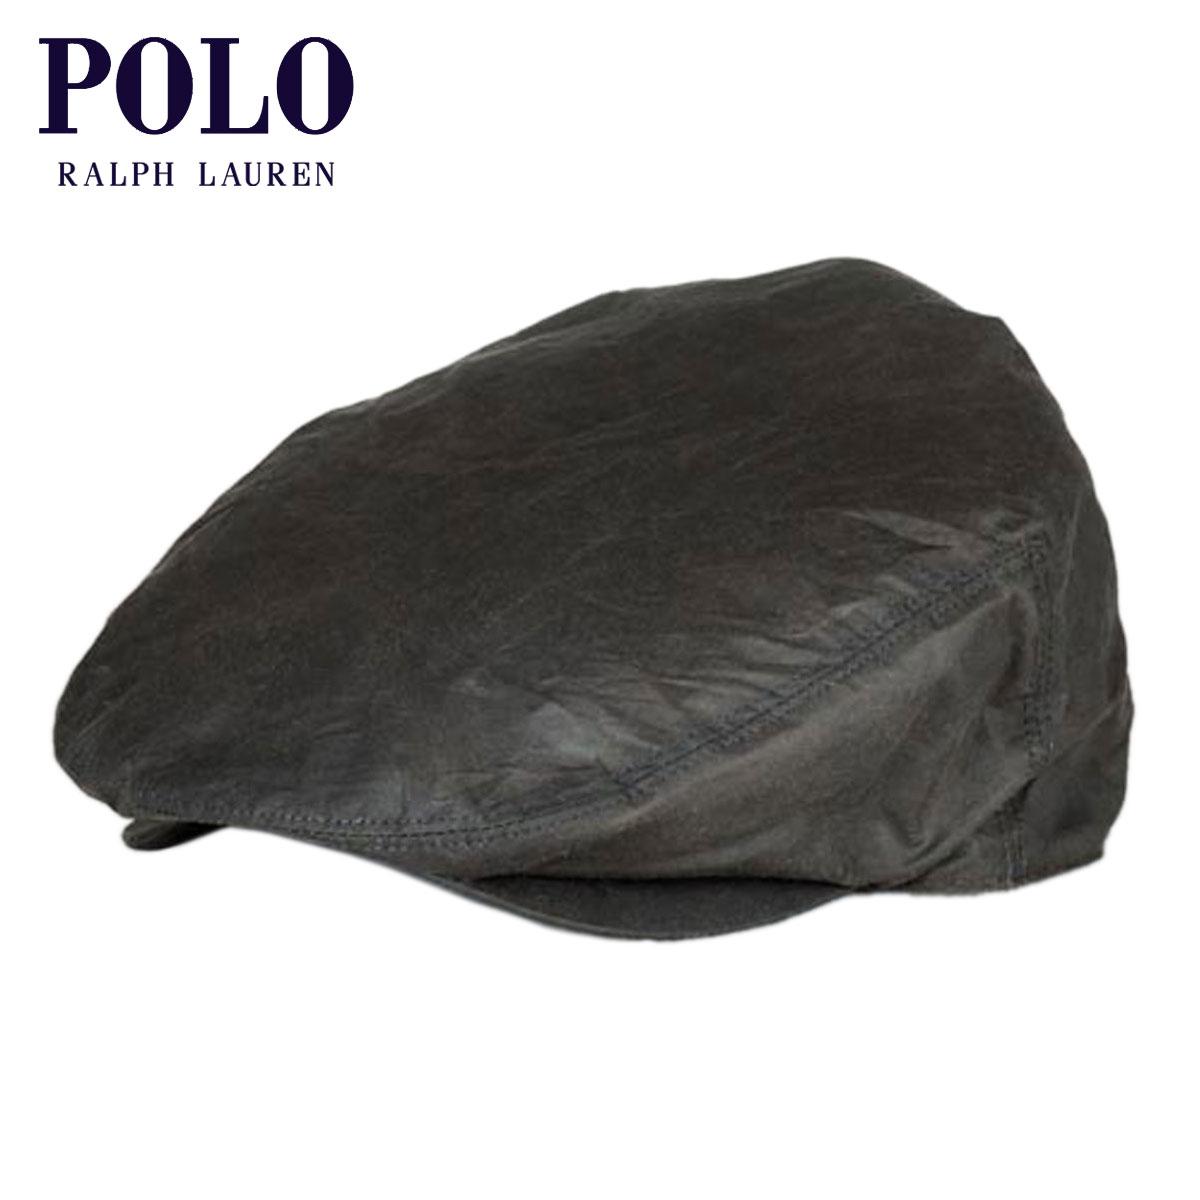 9de70c8a Polo Ralph Lauren POLO RALPH LAUREN regular article men hat hat OILCLOTH DRIVING  CAP D20S30